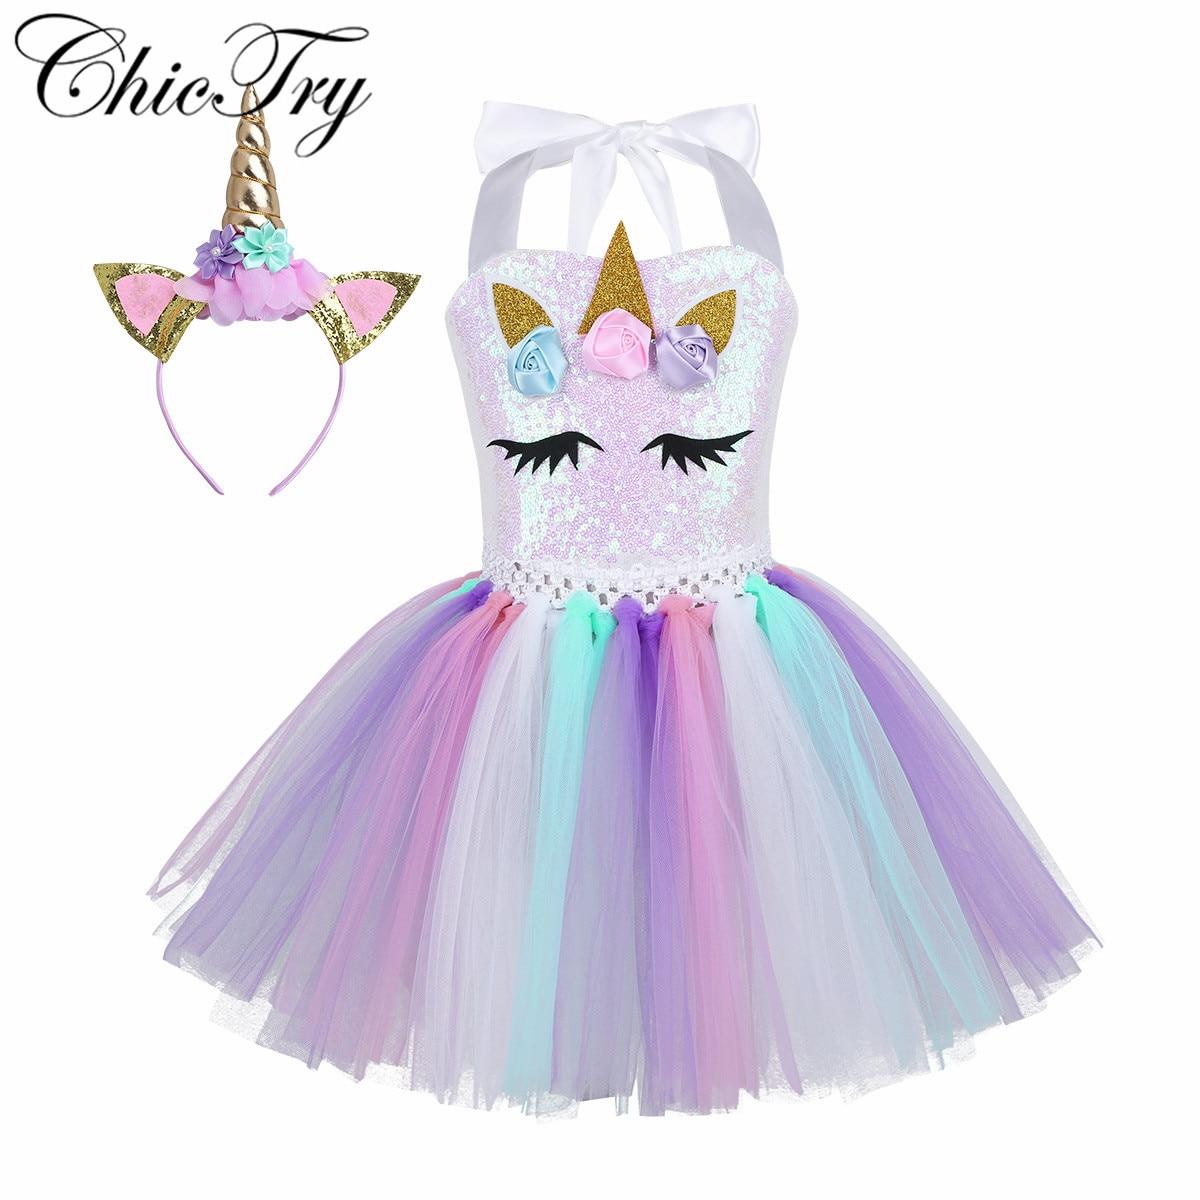 Kids Girls Sequins Cartoon Cosplay Dress 3D Flowers Dress Up Cosplay Clothes Kids Party Dancing Dress Girls Xmas Gift Dresses